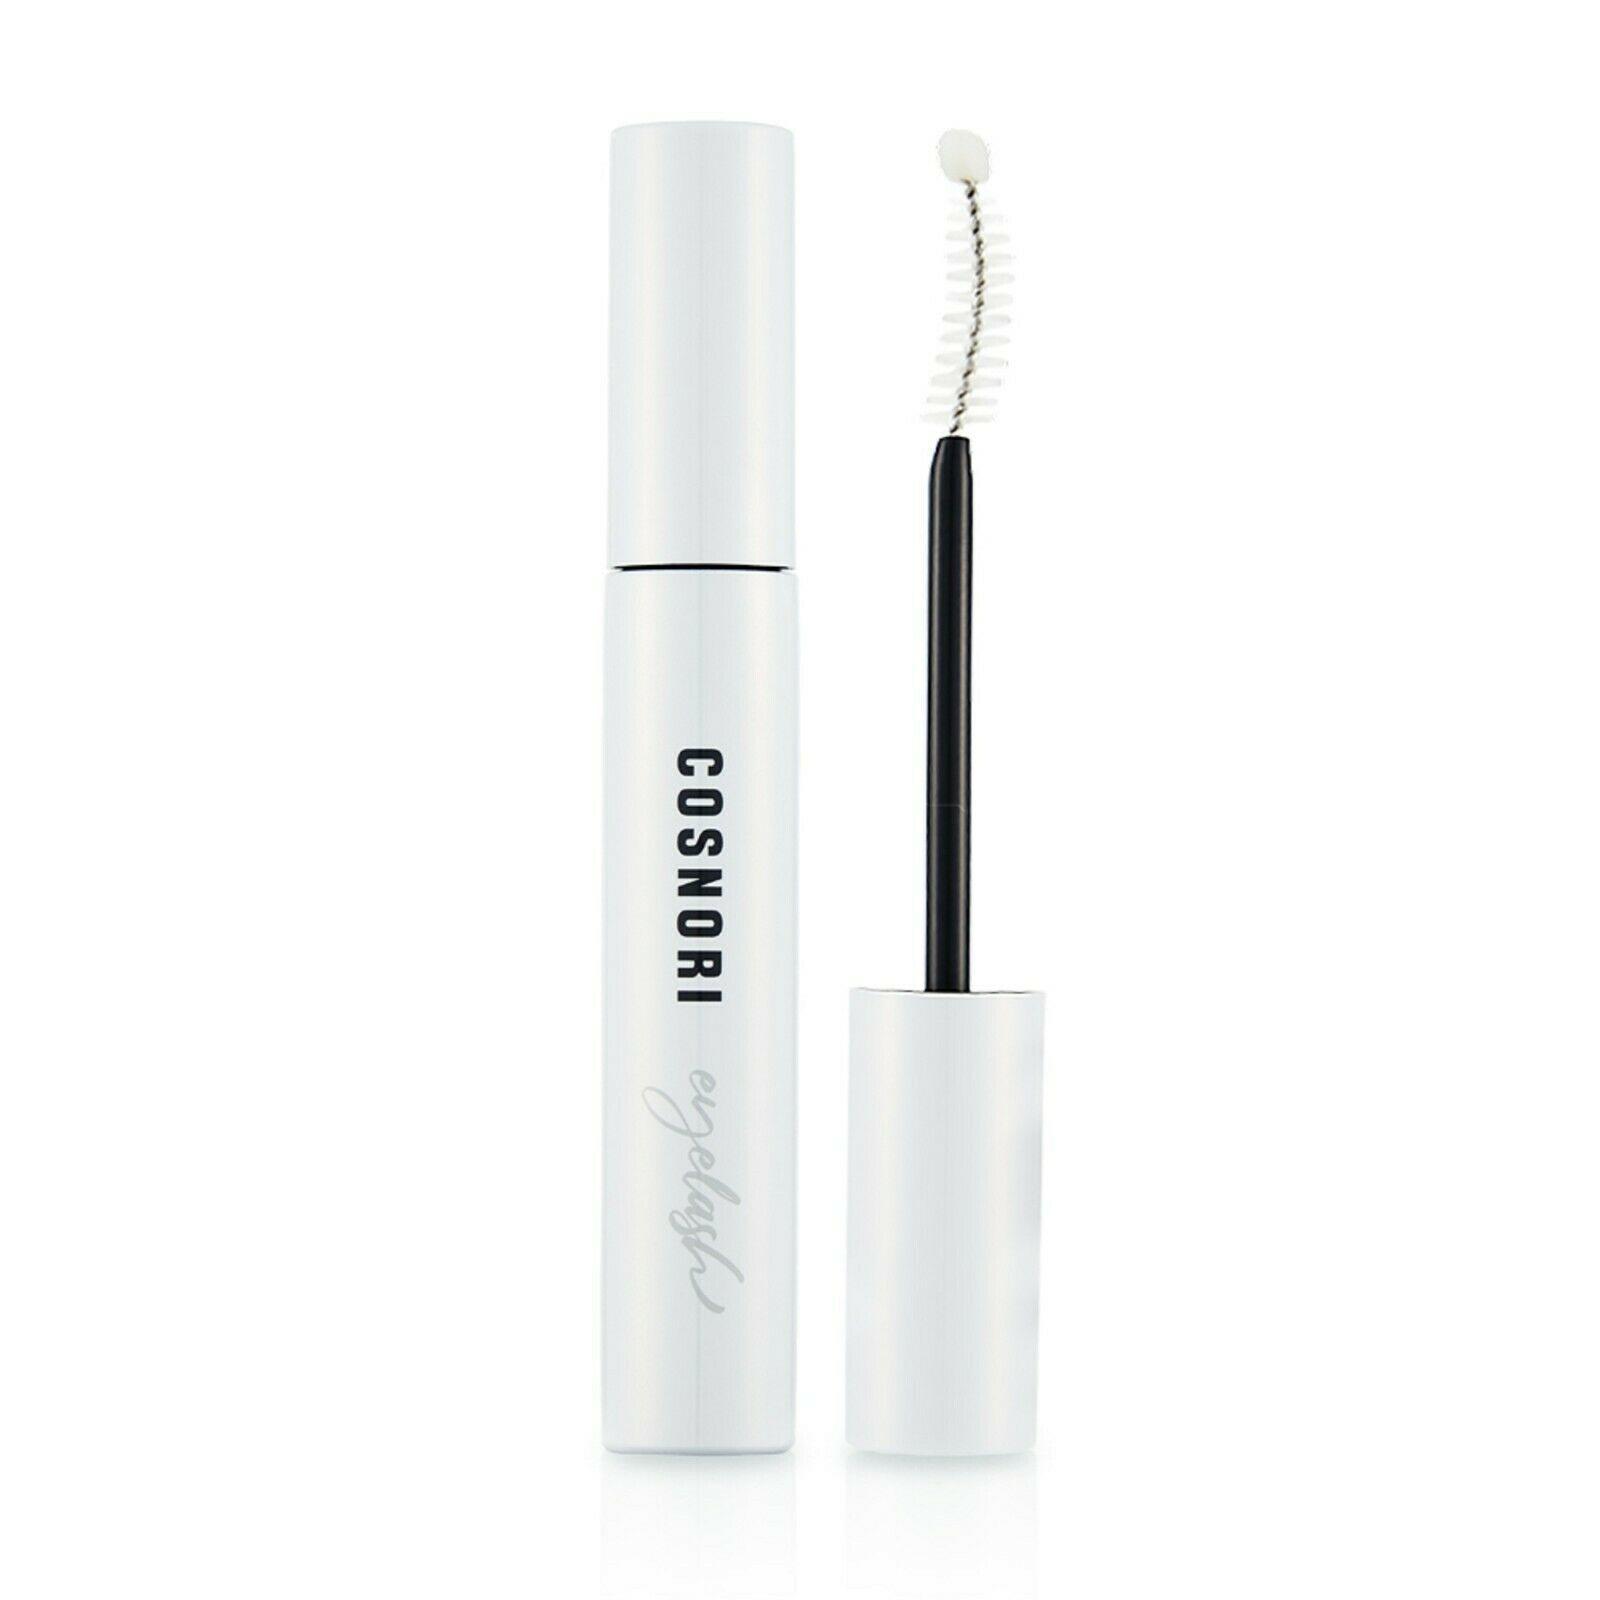 Cosnori Long Active Eyelash Lash Growth Conditioner Supplements Cosmetics 9g